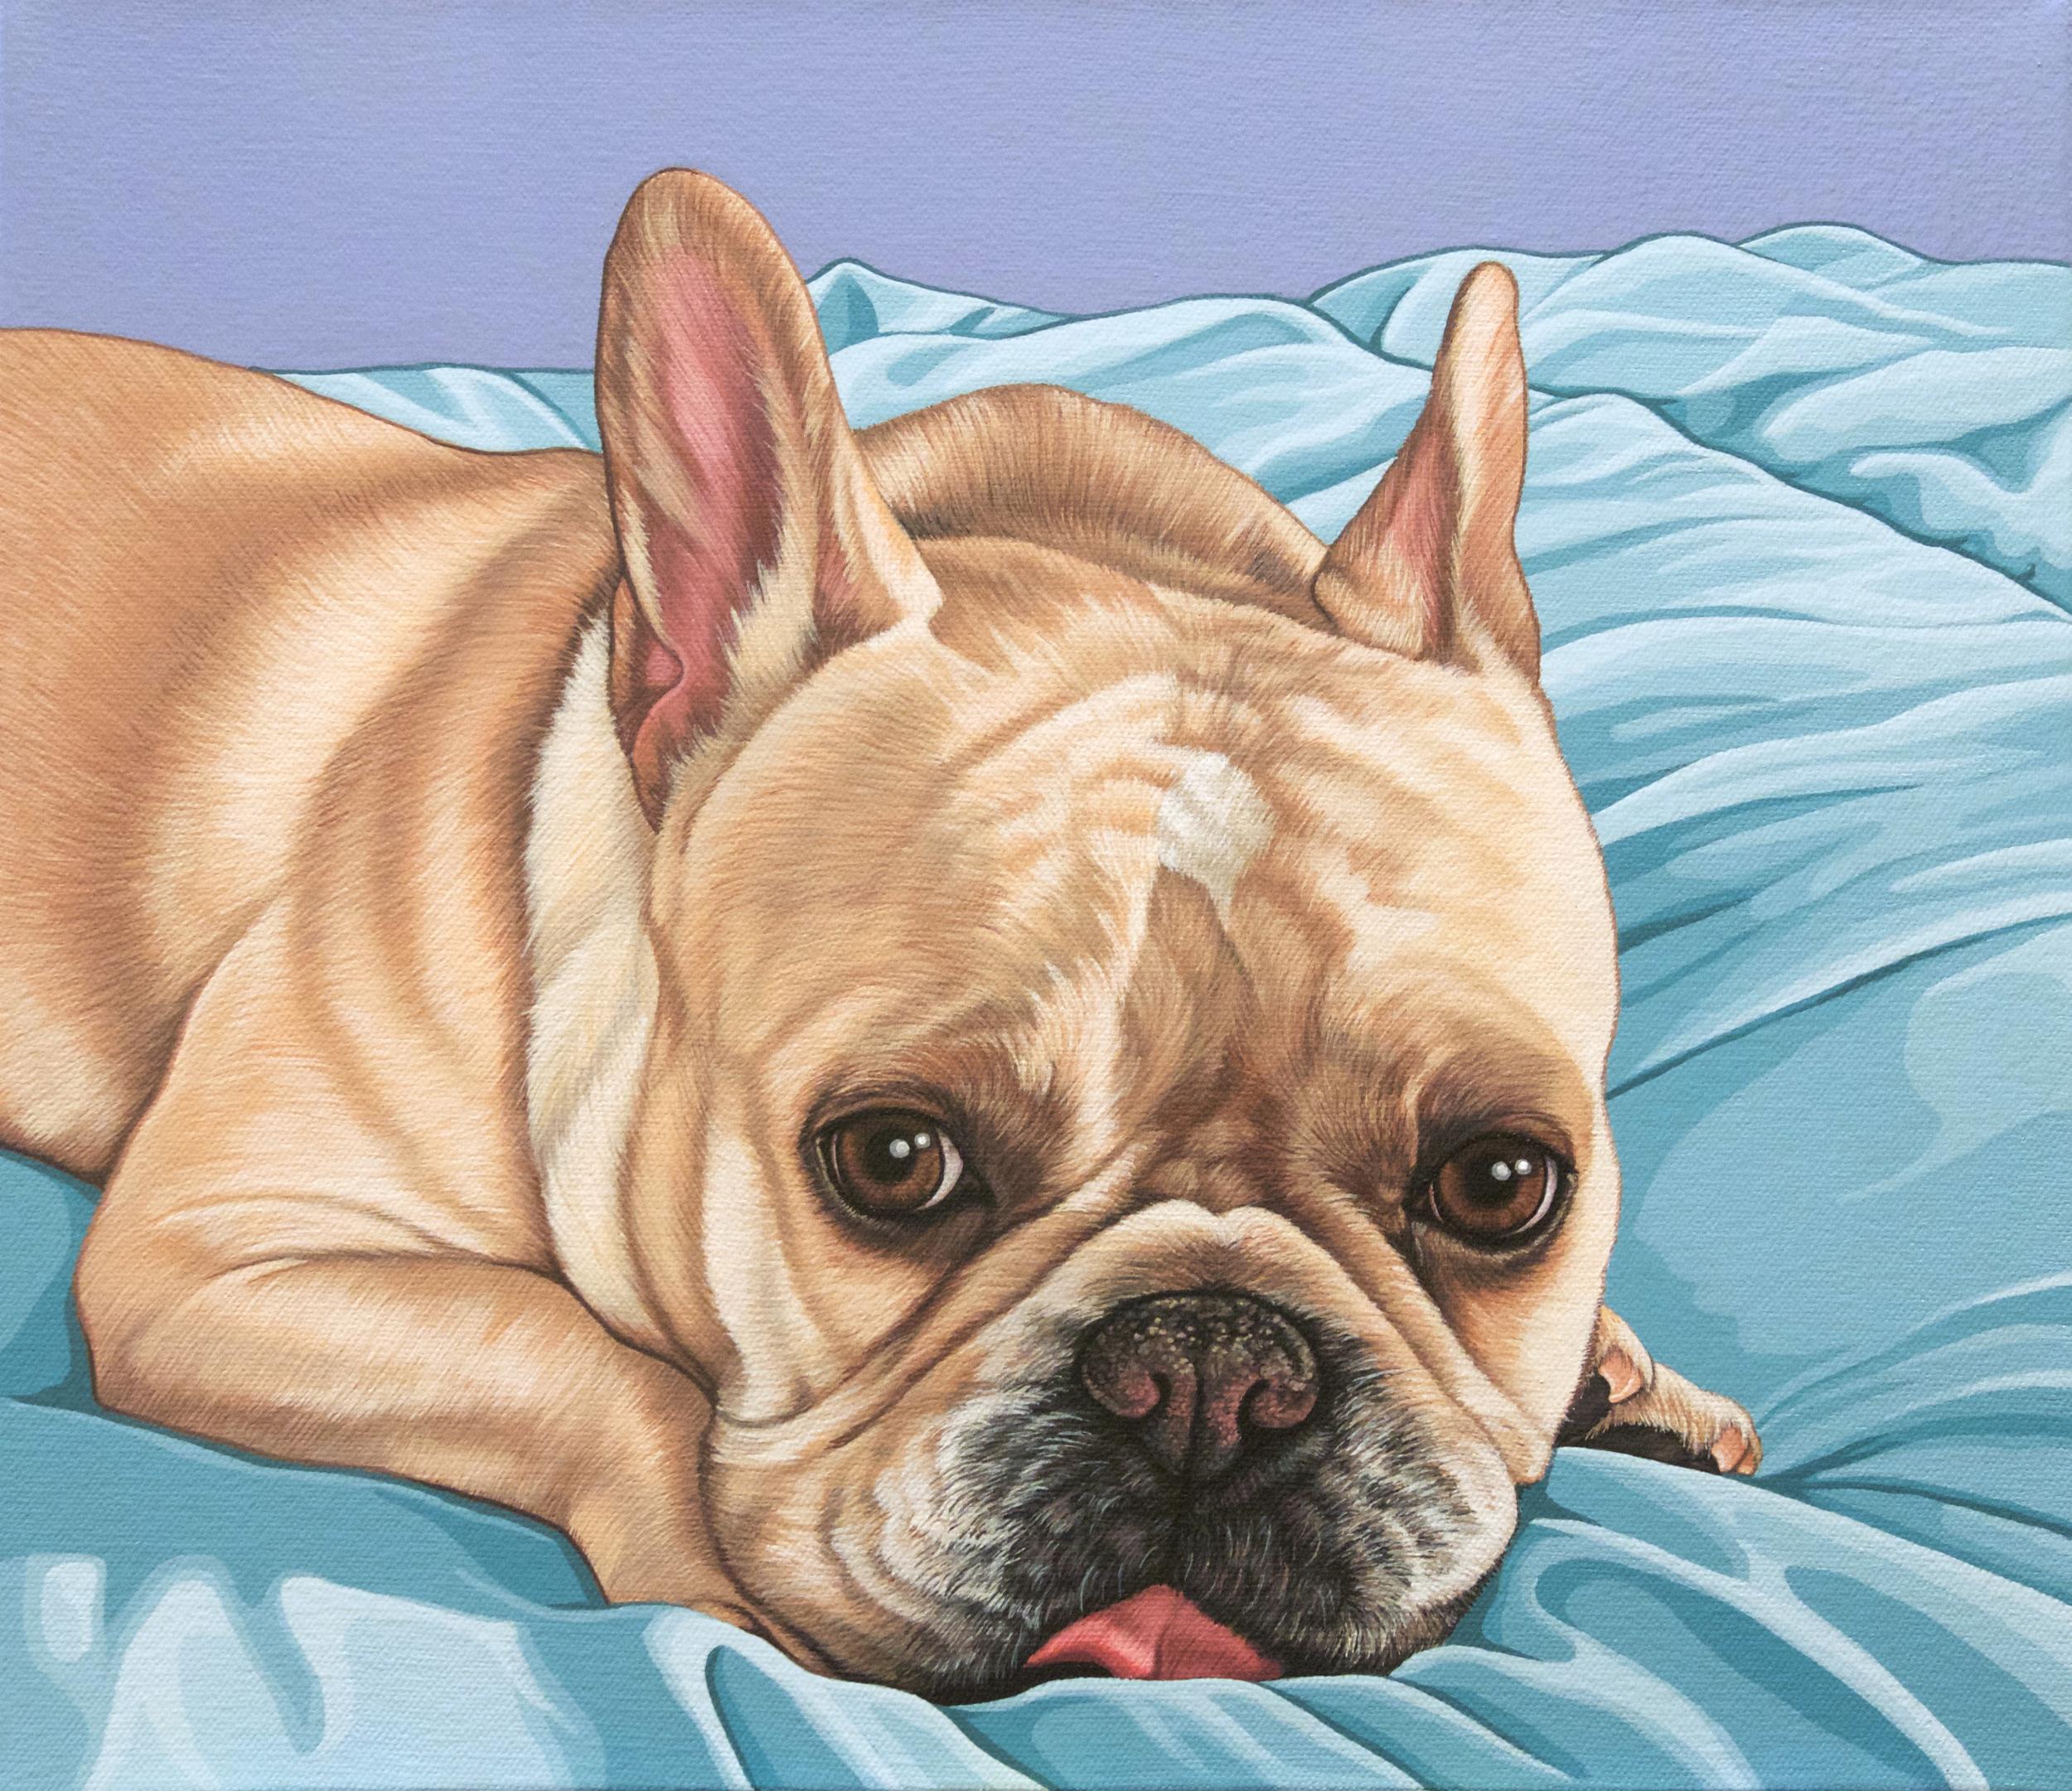 """Ricky"", latex enamel on canvas, 12"" x 14"", 2016"